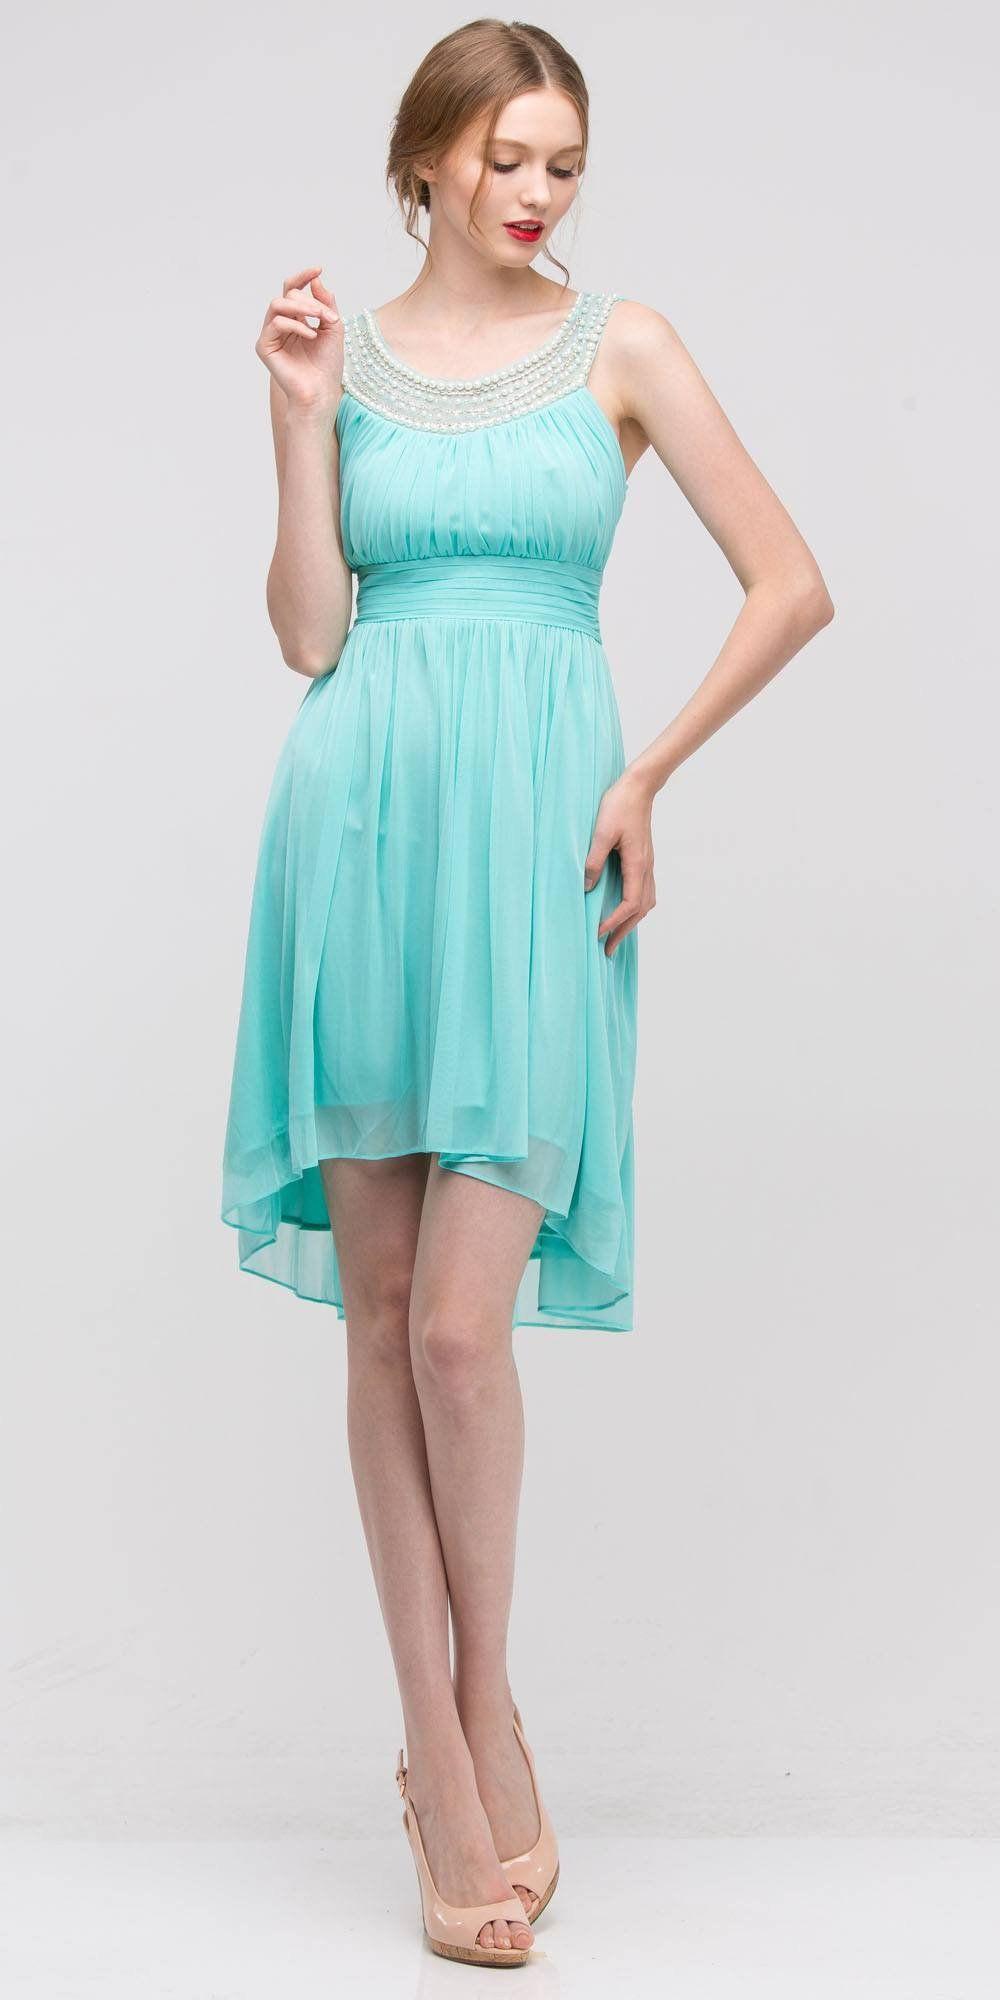 Modern Dinner Party Dress Ideas Ensign - Colorful Wedding Dress ...